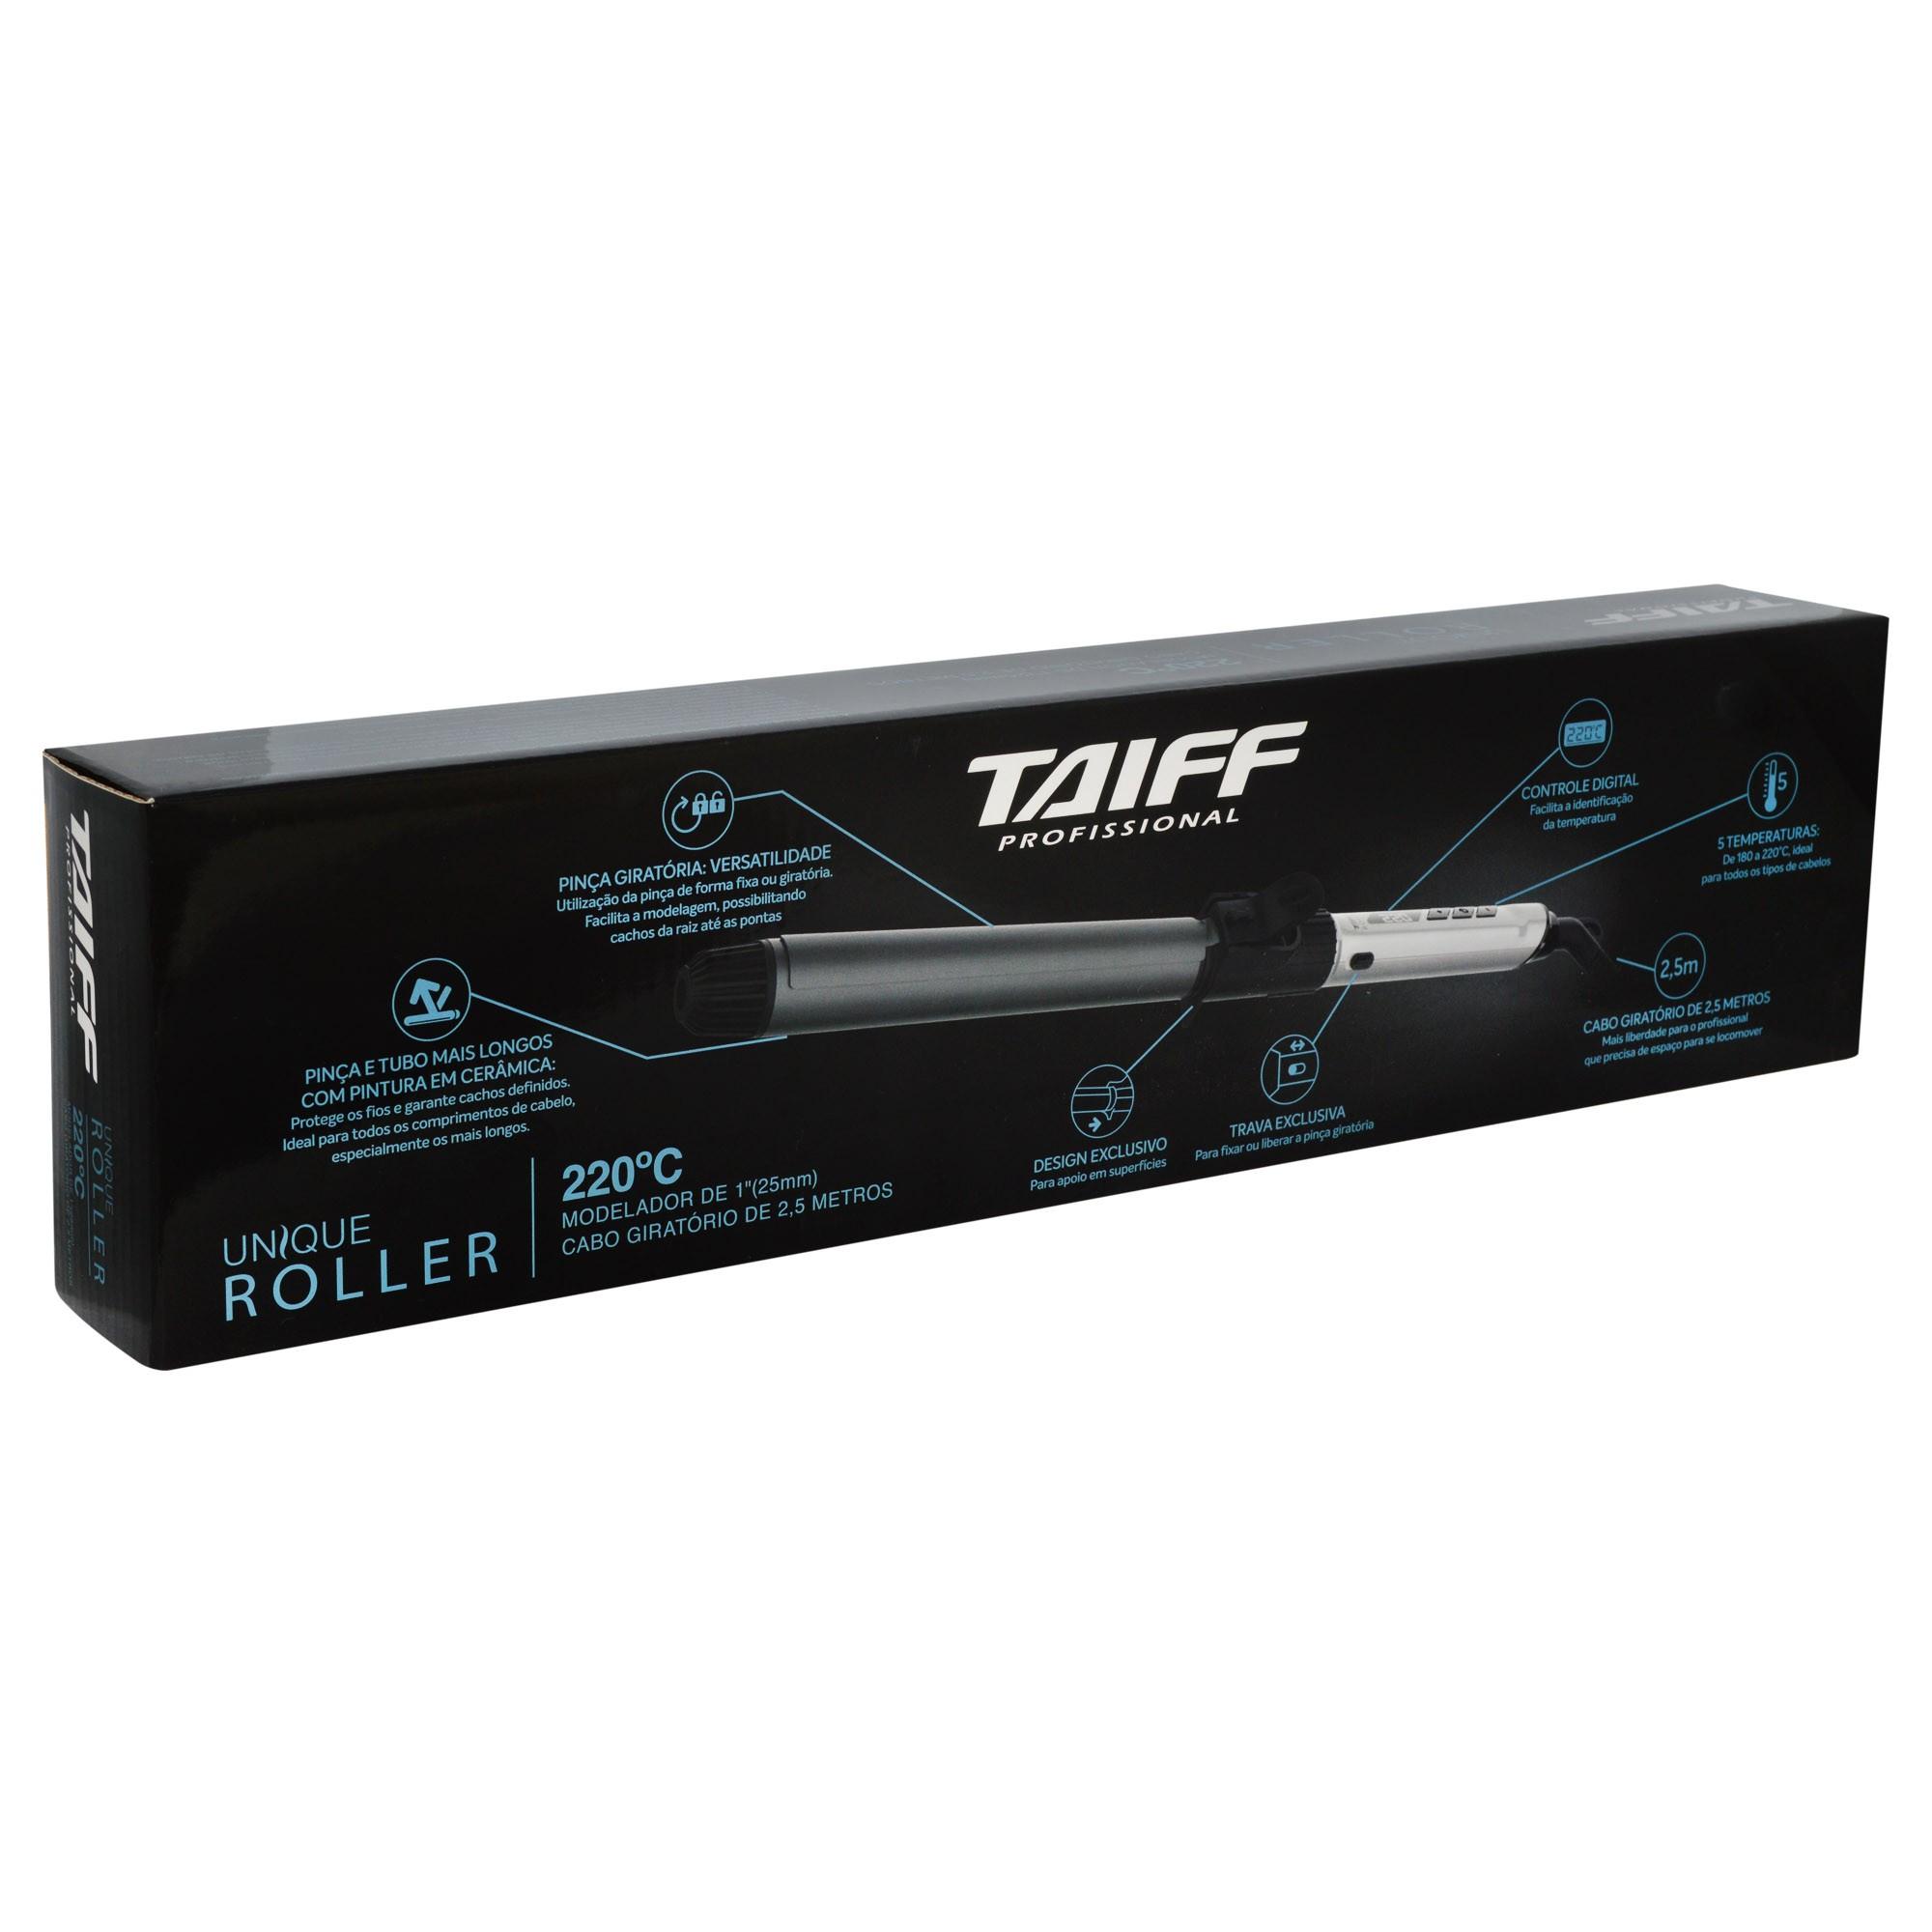 Modelador Cachos Unique Roller 220ºc 25mm - Taiff